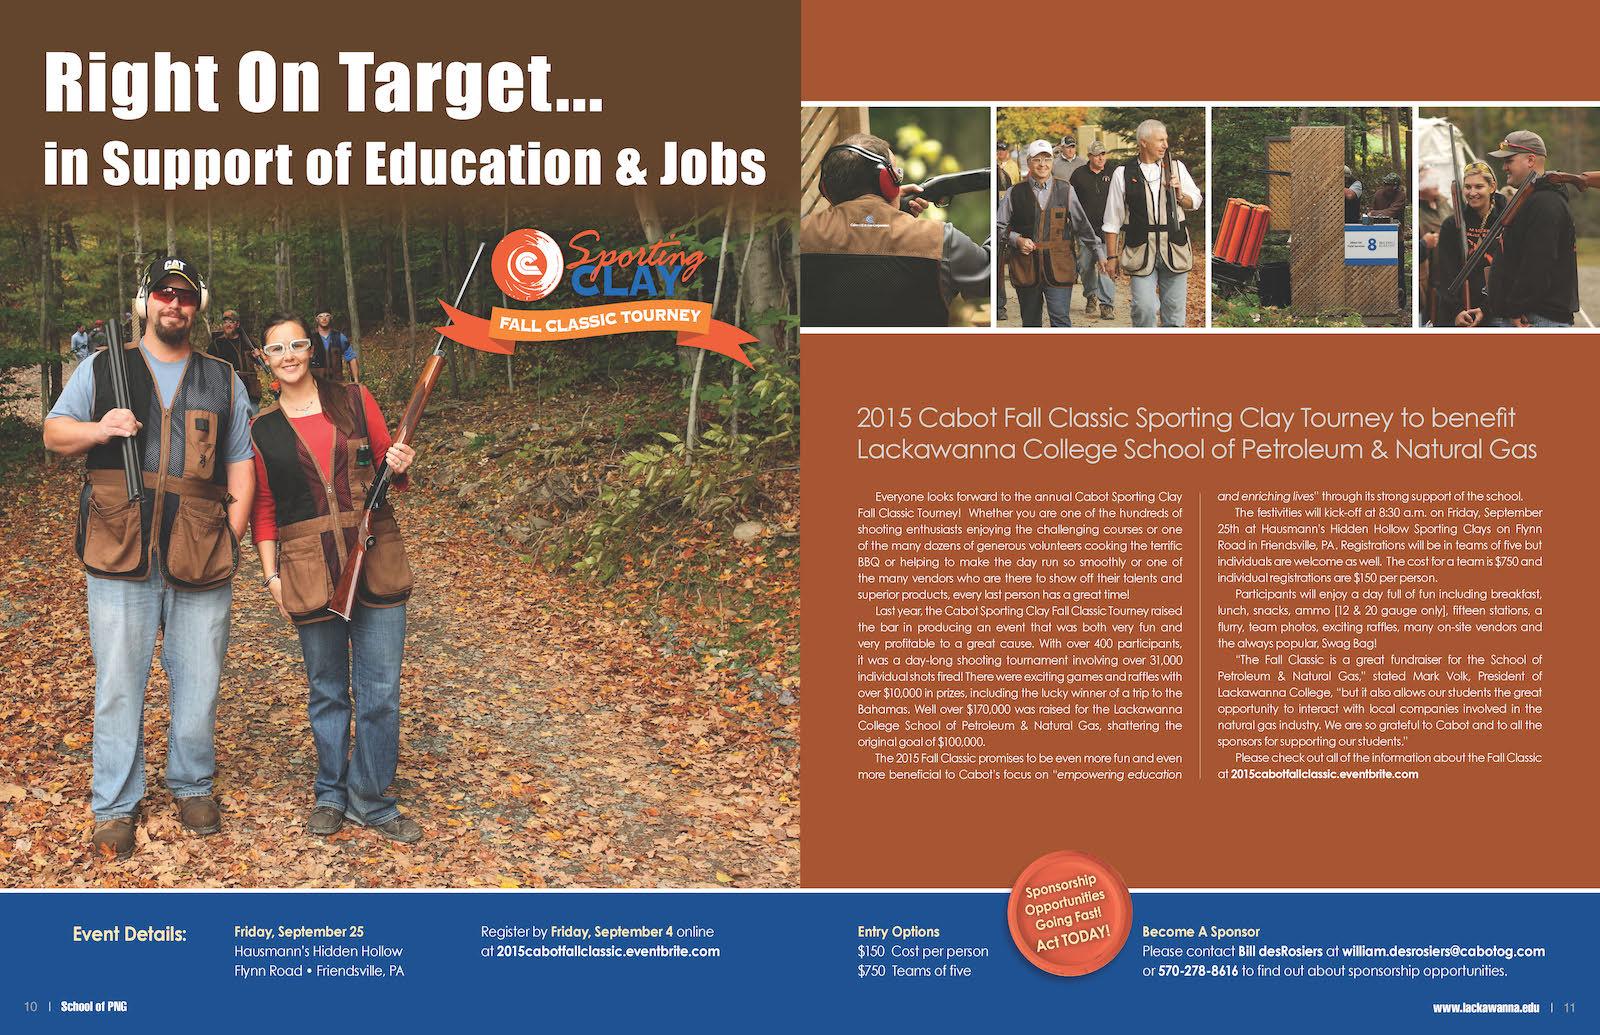 Lackawanna College, Cabot Oil & Gas Corporation – School of Petroleum & Natural Gas Magazine